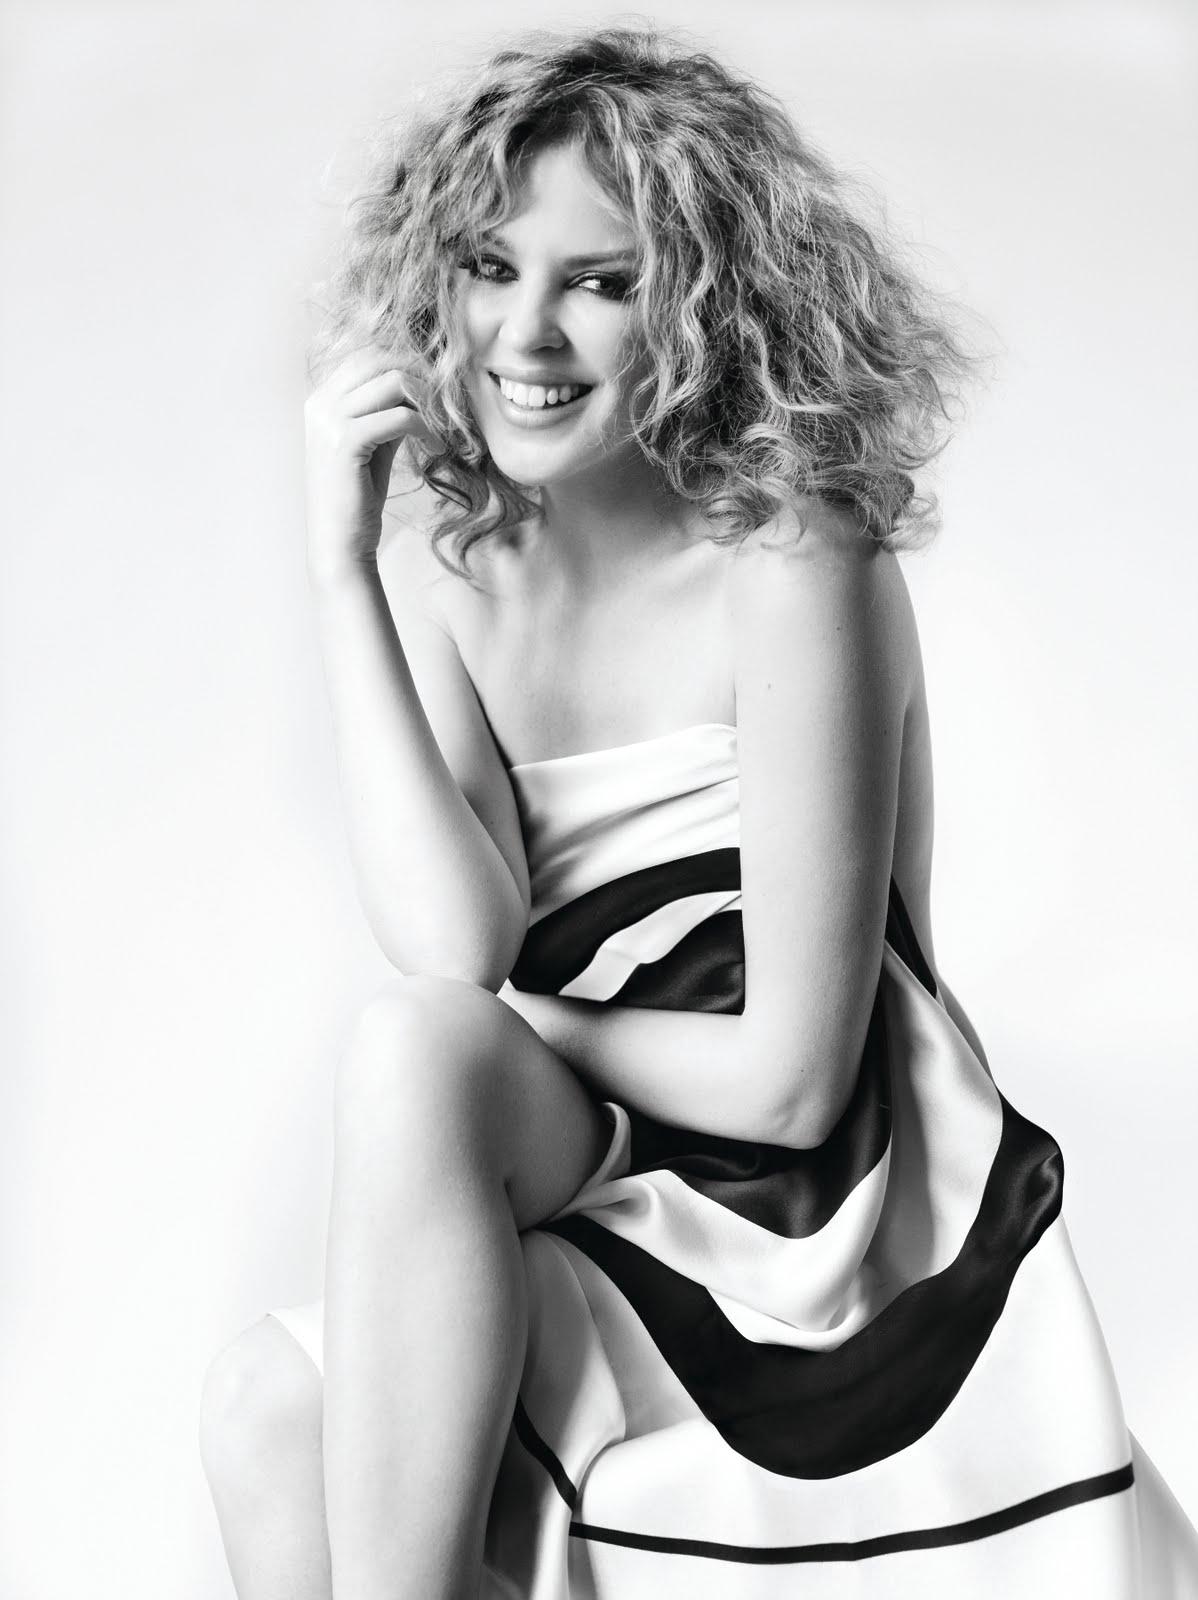 http://4.bp.blogspot.com/_lSFBPXf1X08/S7IdTD7n08I/AAAAAAAAAL8/wzikPl3PqVc/s1600/Kylie+Minogue++.jpg